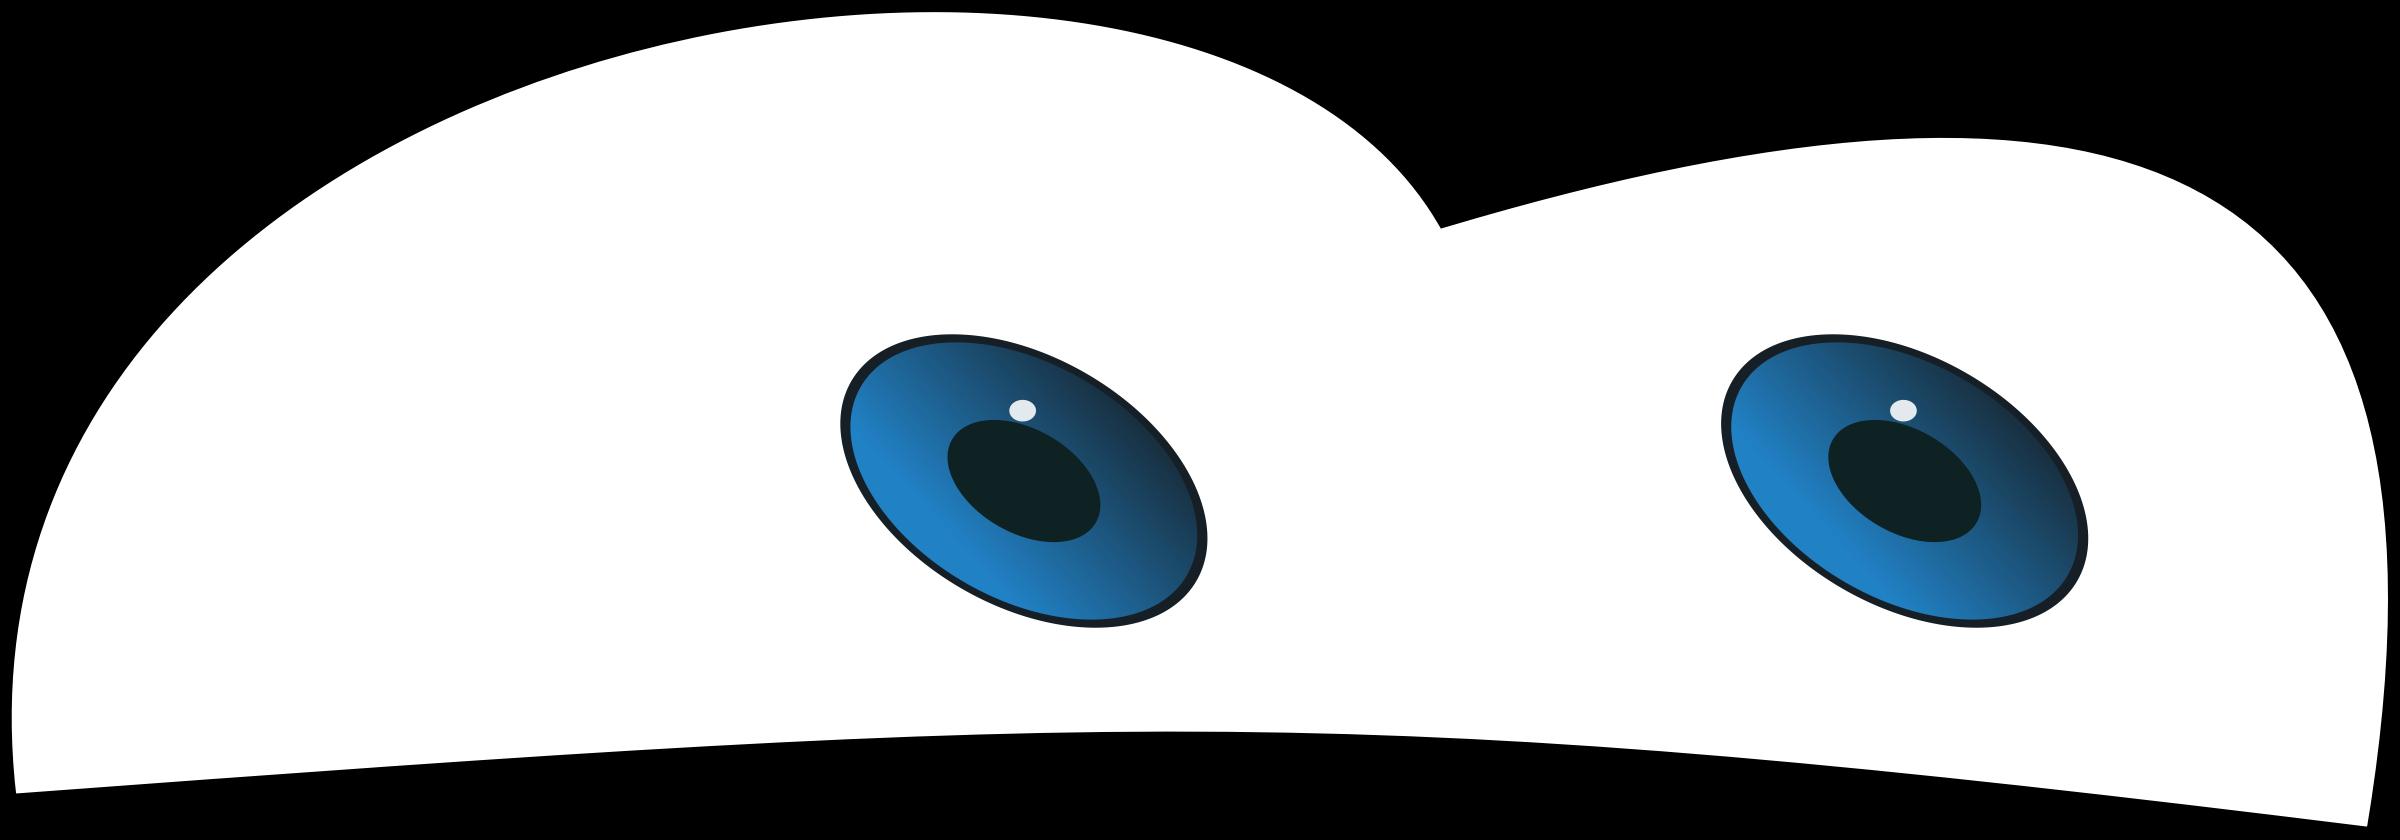 Car eye frames illustrations. Clipart cars pencil